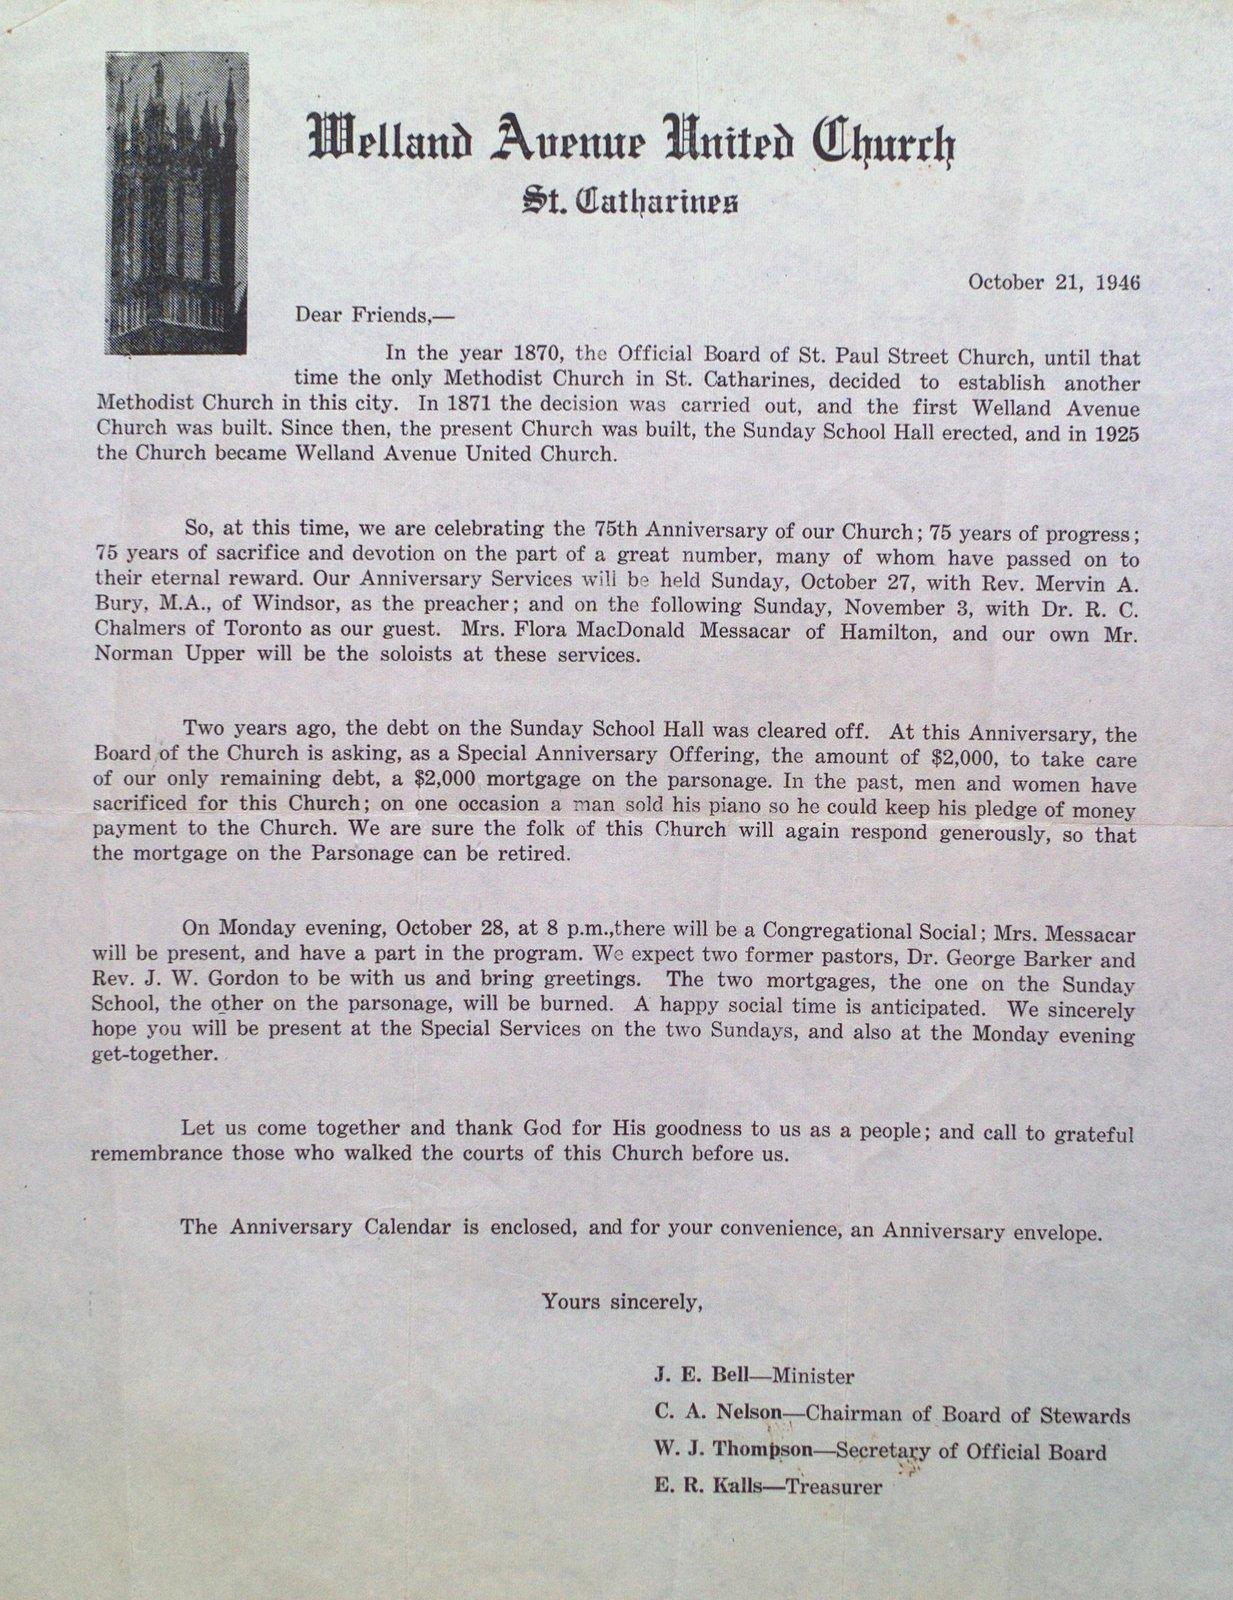 Welland Avenue United Church Anniversary Letter